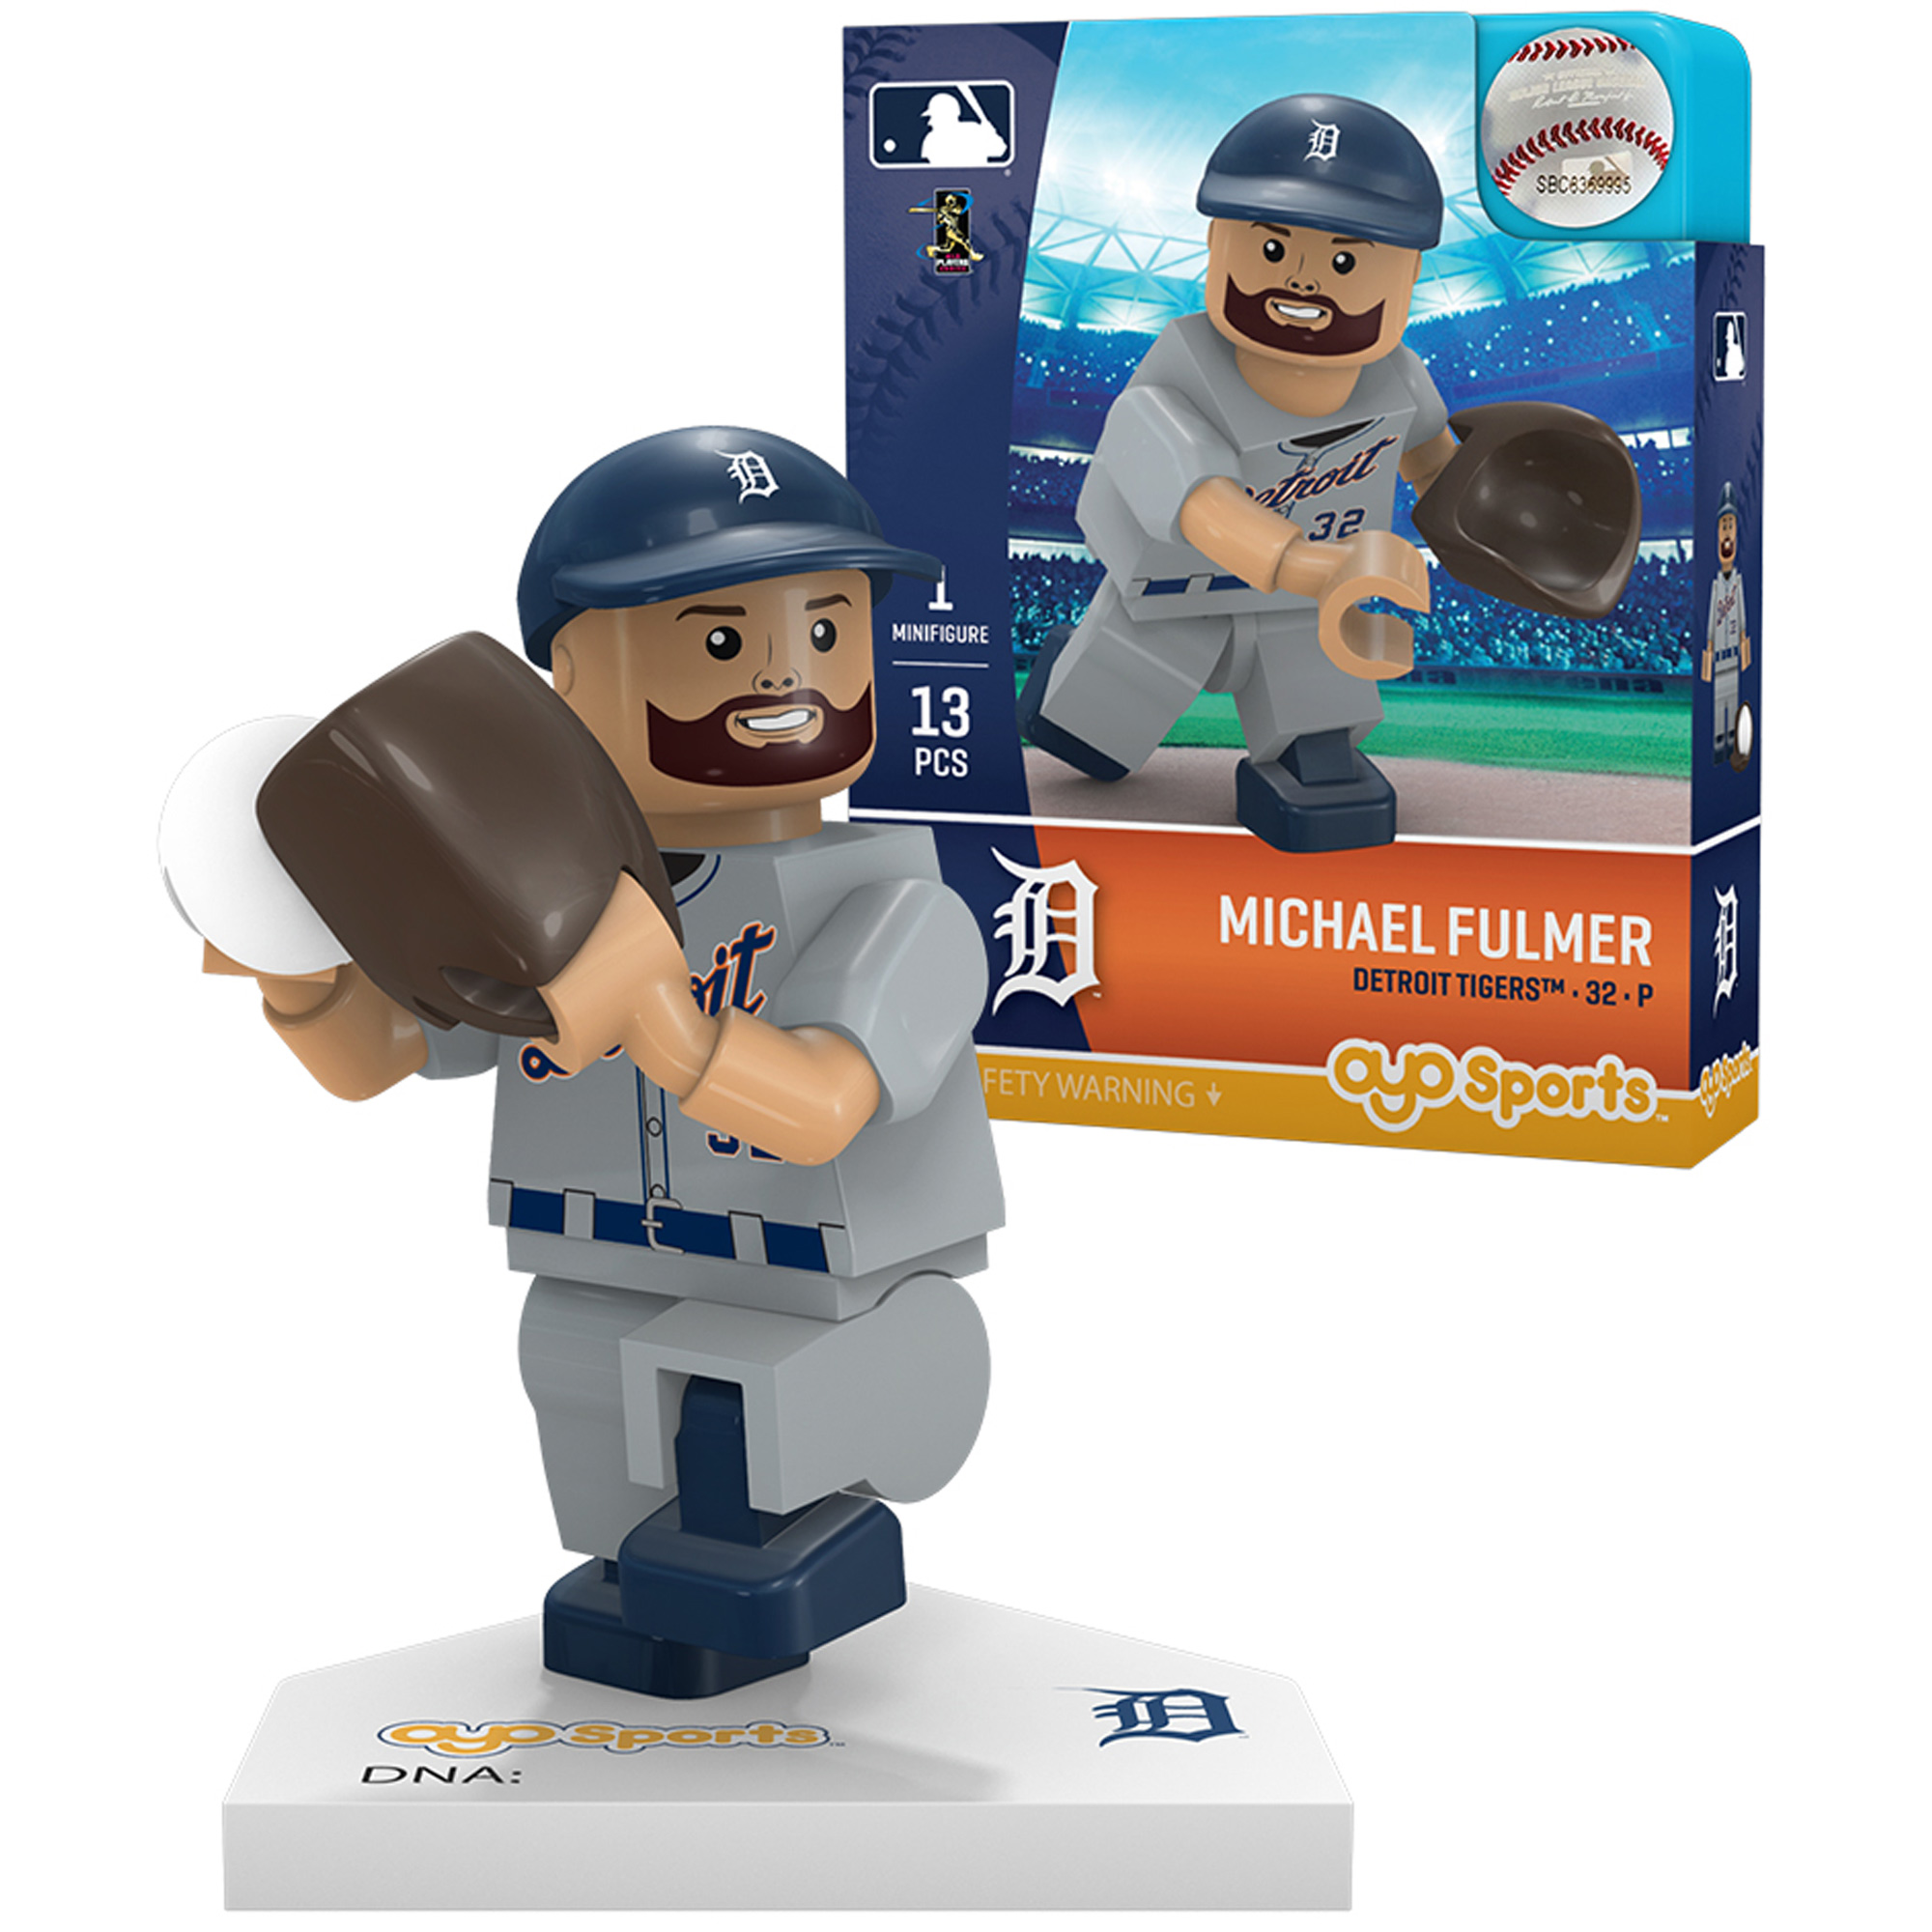 Michael Fulmer Detroit Tigers OYO Sports Generation 5 Player Minifigurine - No Size